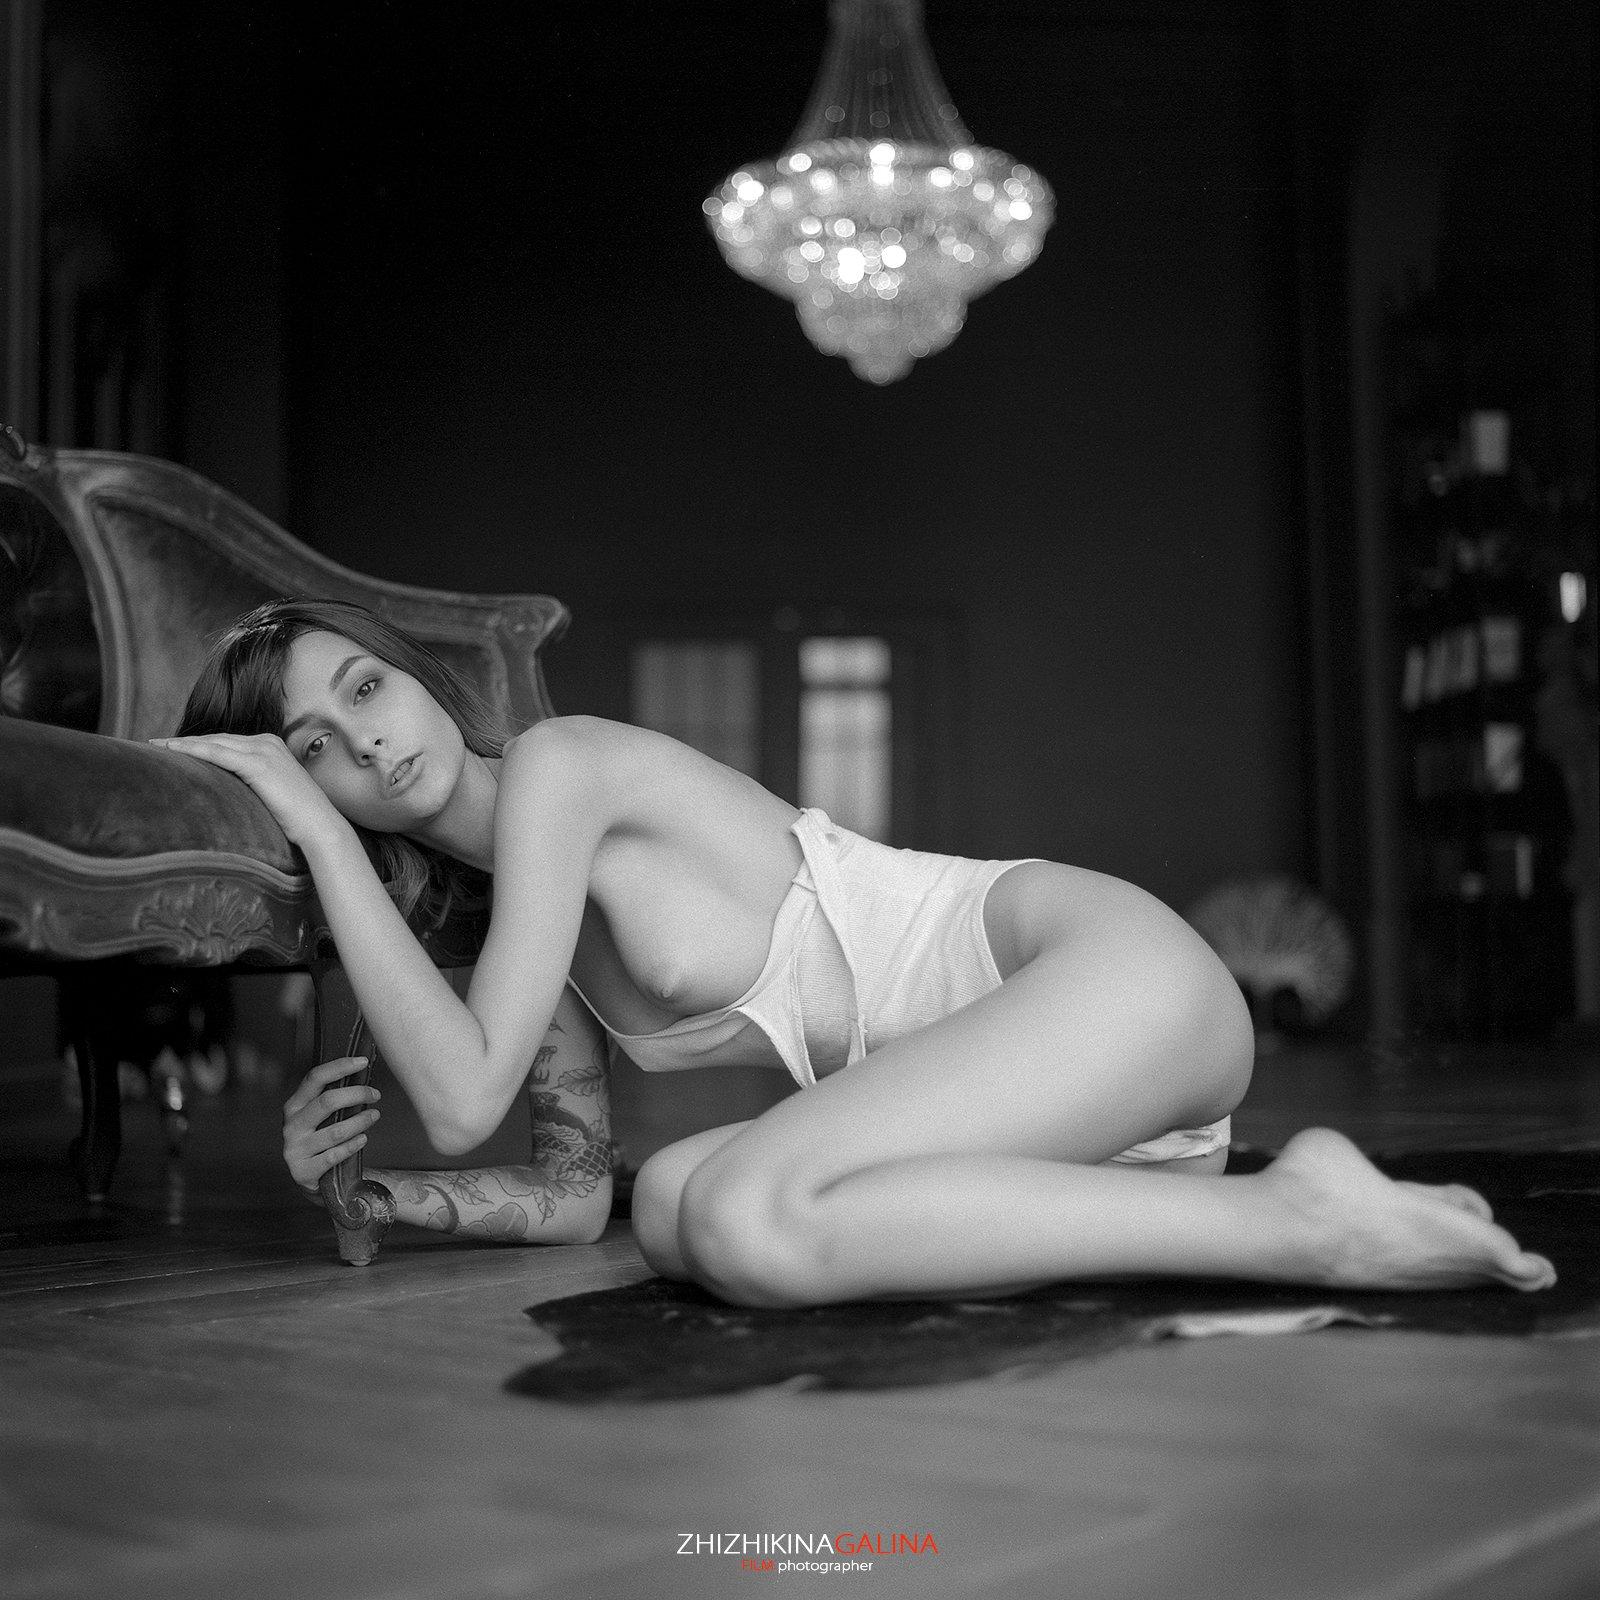 nude, girl, artphoto, 6x6, bw, b&w, blackandwhite, девушка, портрет, лицо, фотостудия, пленка, фотограф, чб, черно-белое, настроение, жанр, прикосновение, Галина Жижикина